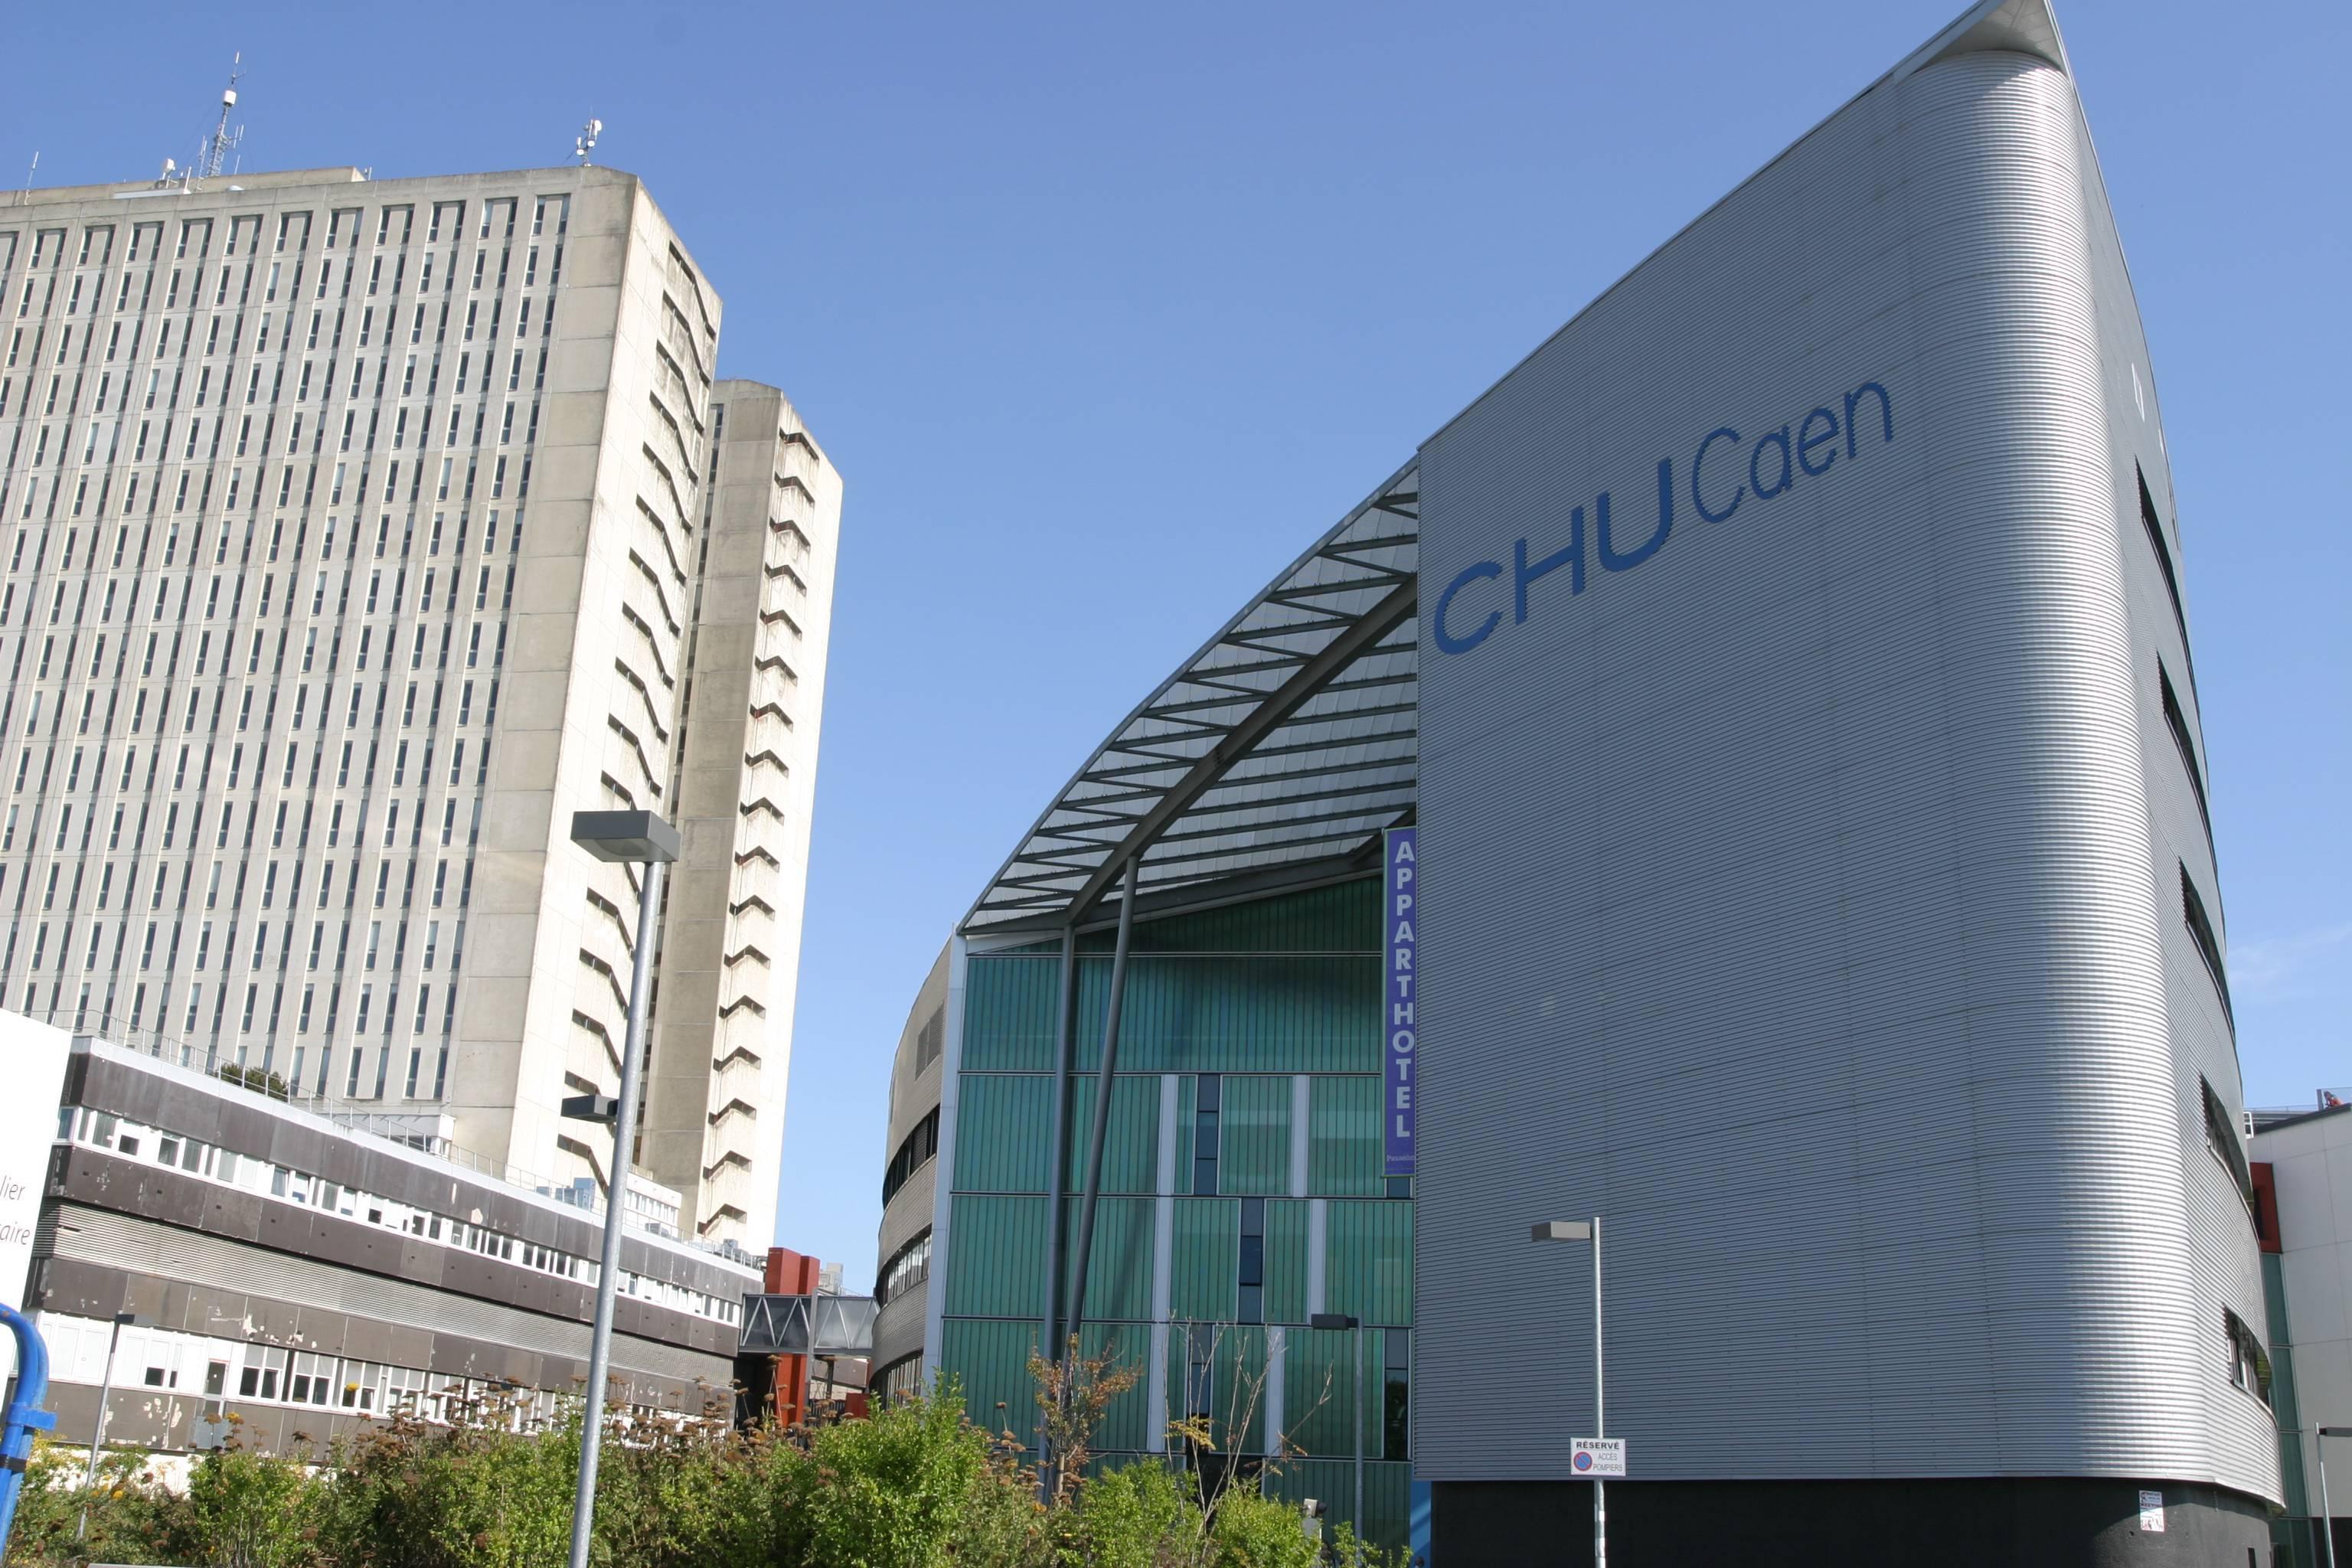 Centre Hospitalier Universitaire de Caen  (Caen)